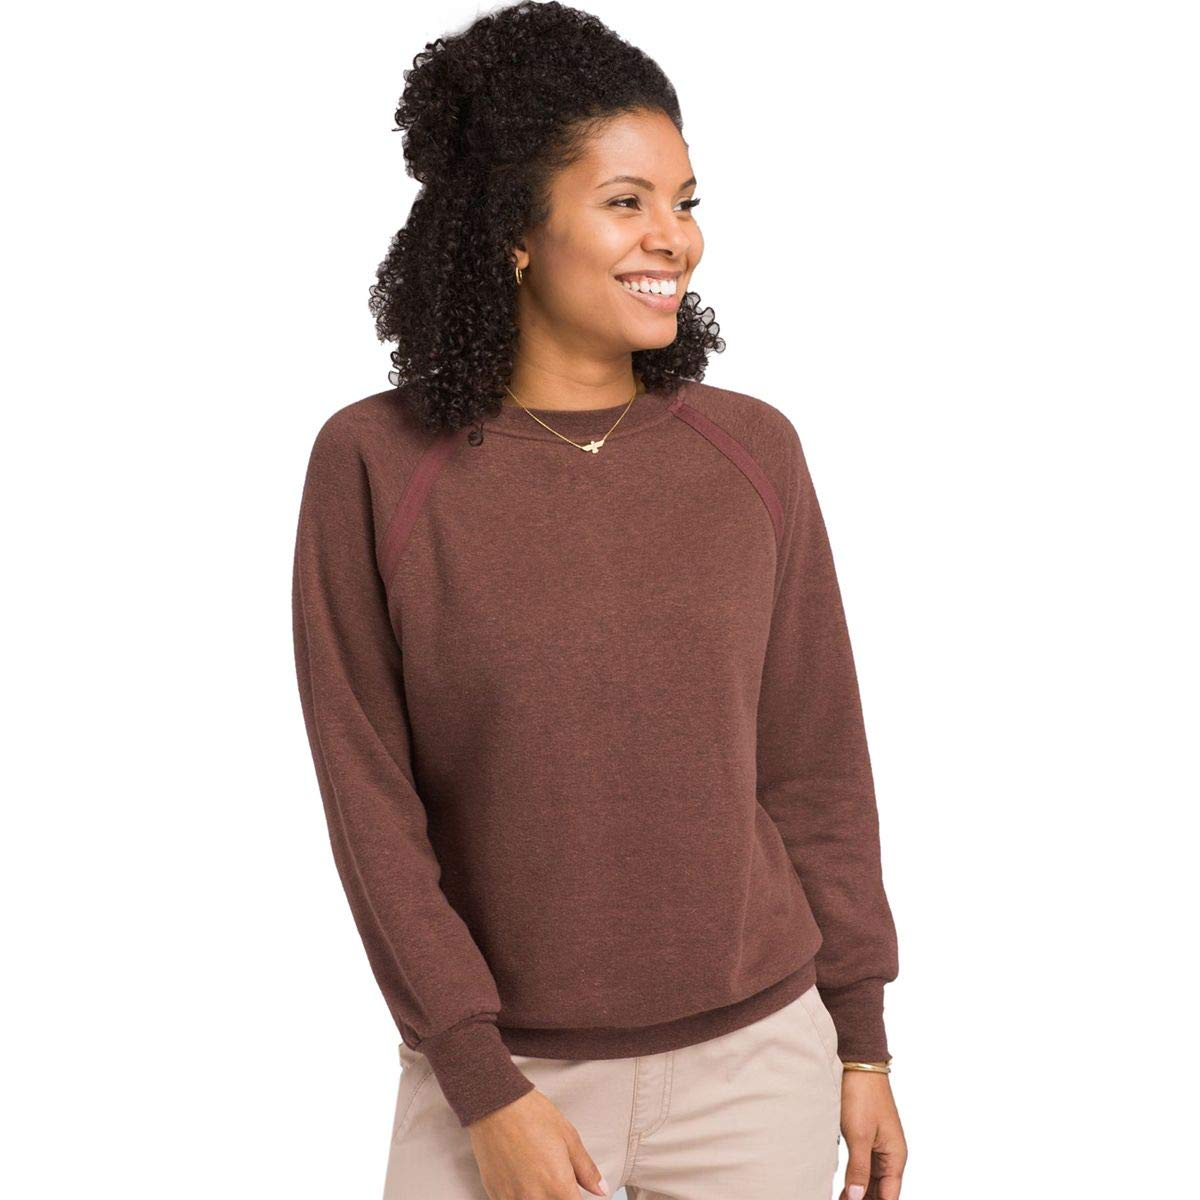 prAna Women's Cozy Up Sweatshirt, Cocoa Heather, Large by prAna